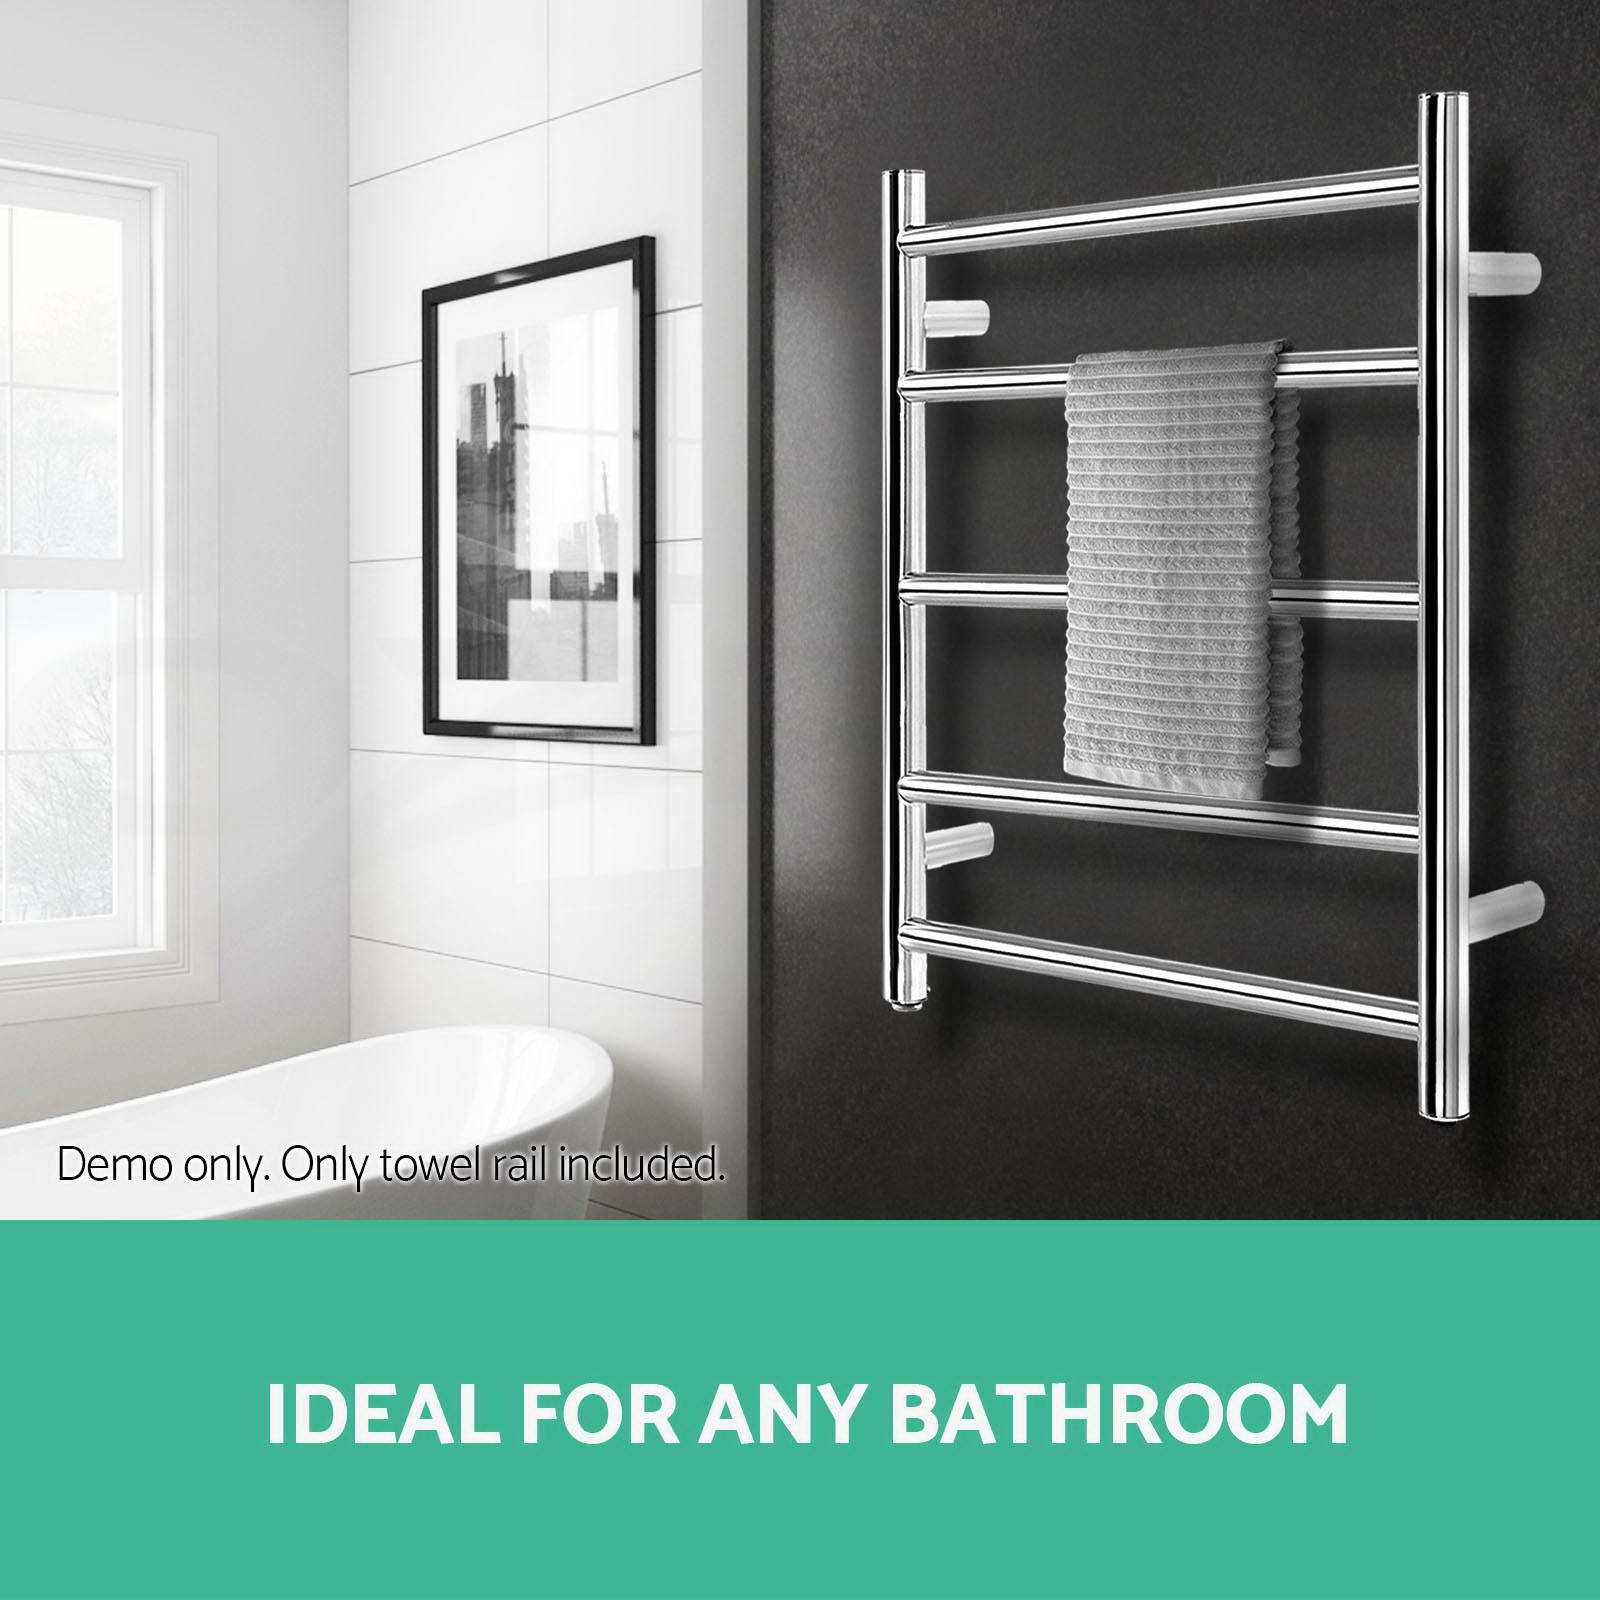 Braddan Stainless Steel Modern Towel Warmer Heated Towel: NEW Electric Heated Towel Rack Warmer Stainless Steel Rail